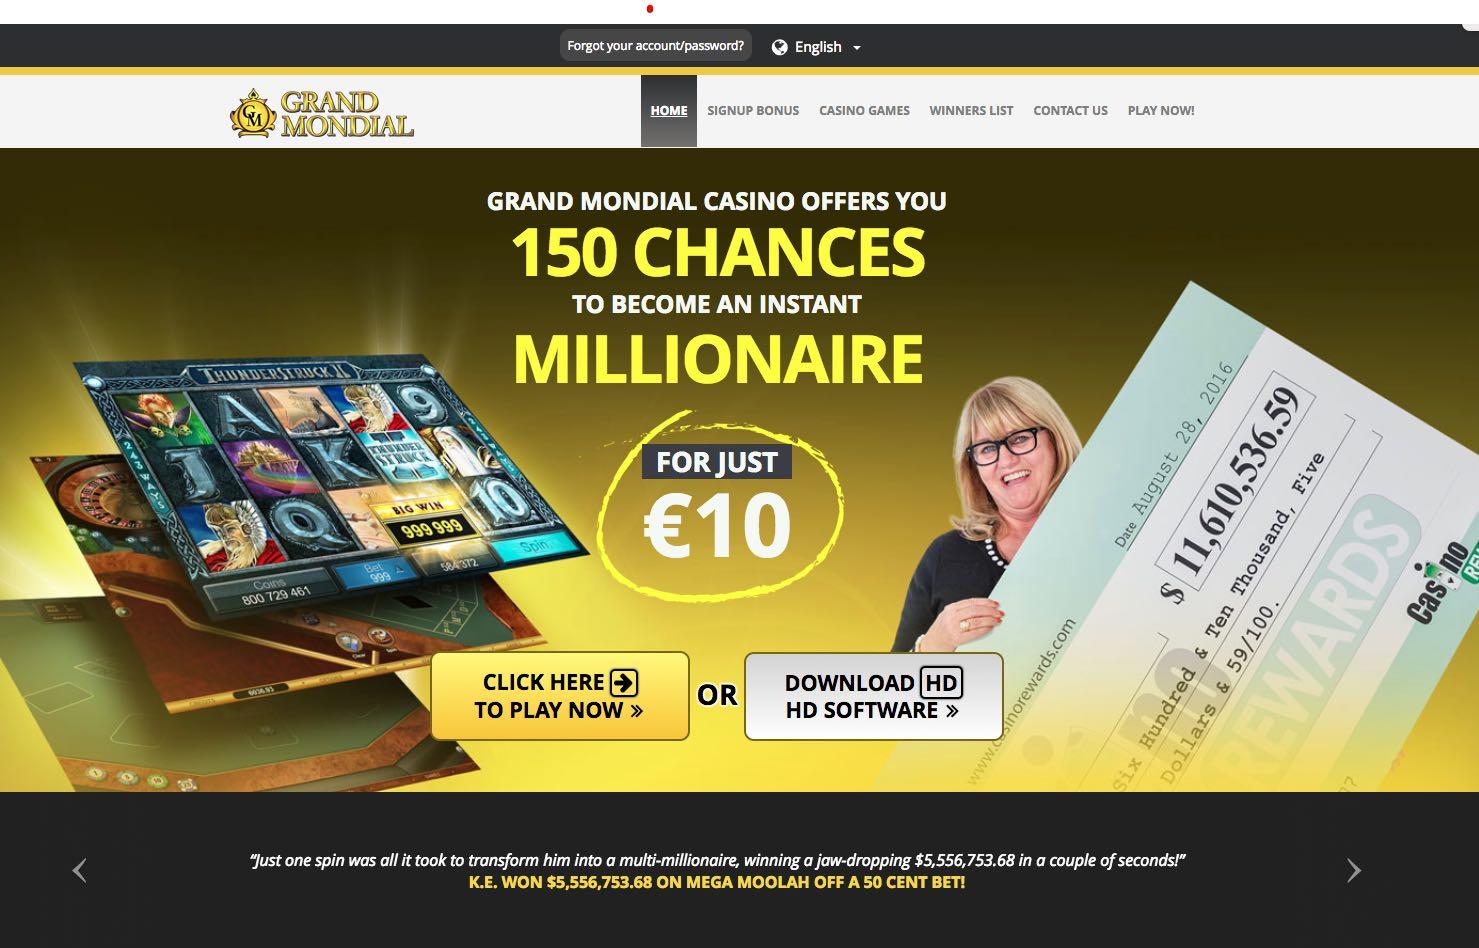 Grand mondial casino spin